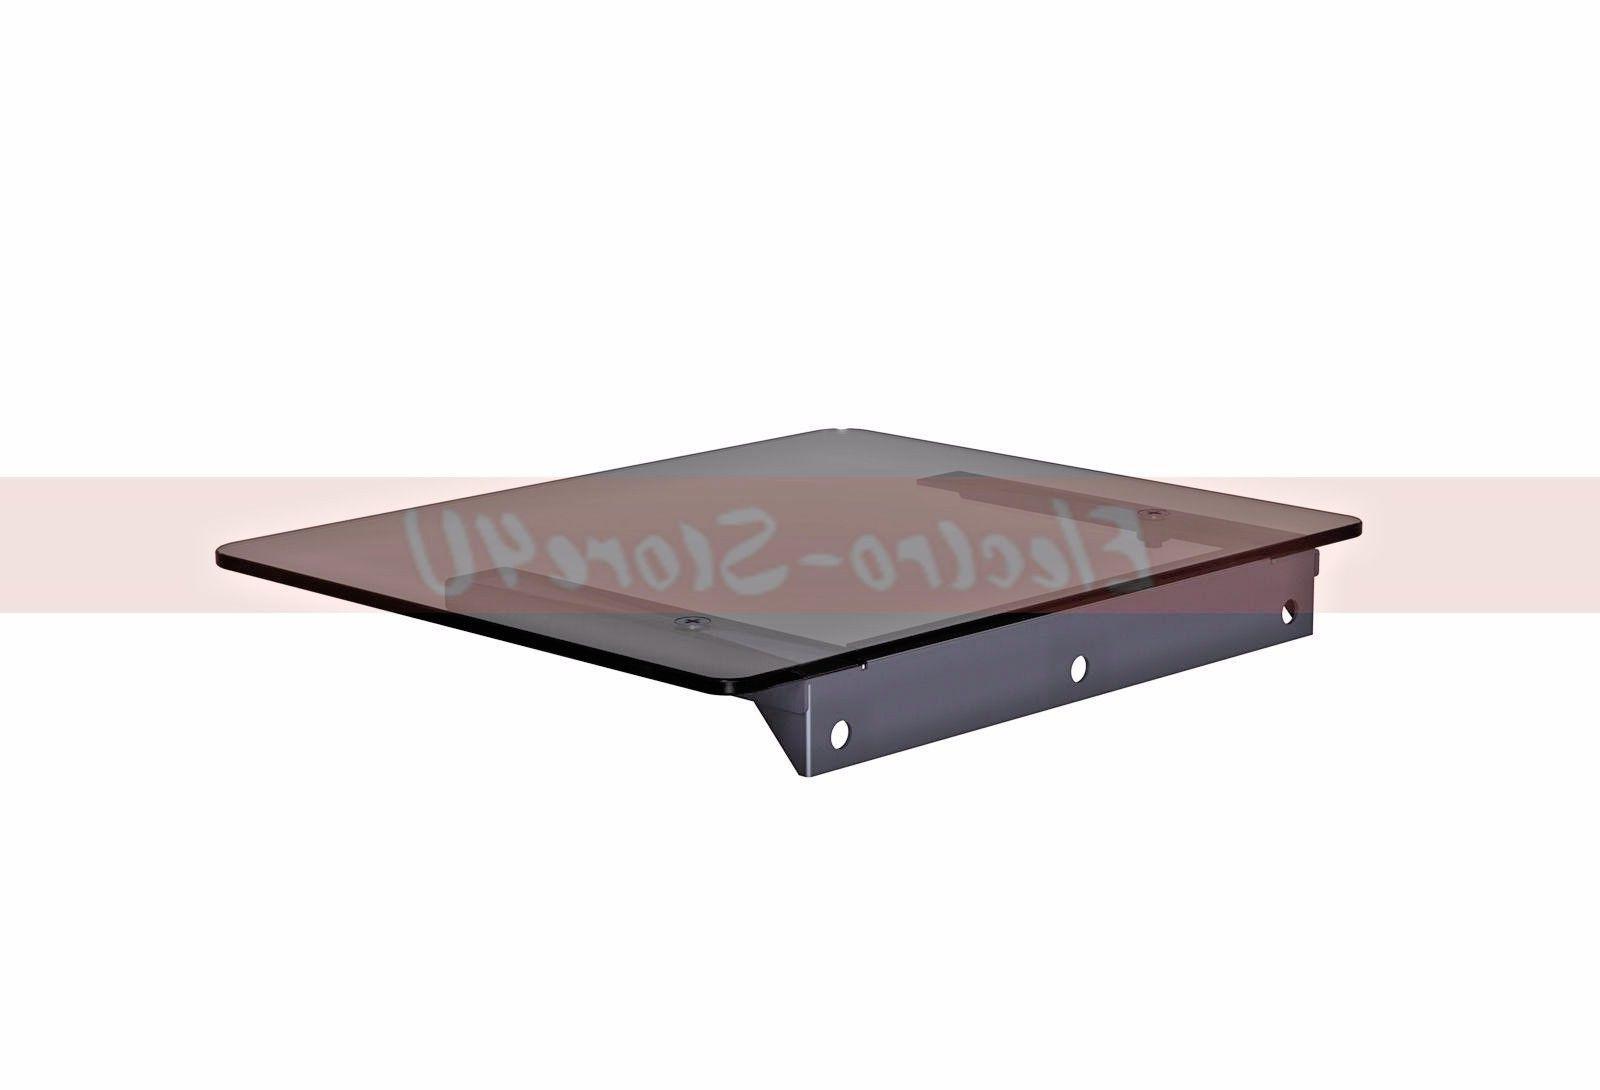 Floating Wall Mount TV AV Stand DVR PS XBOX